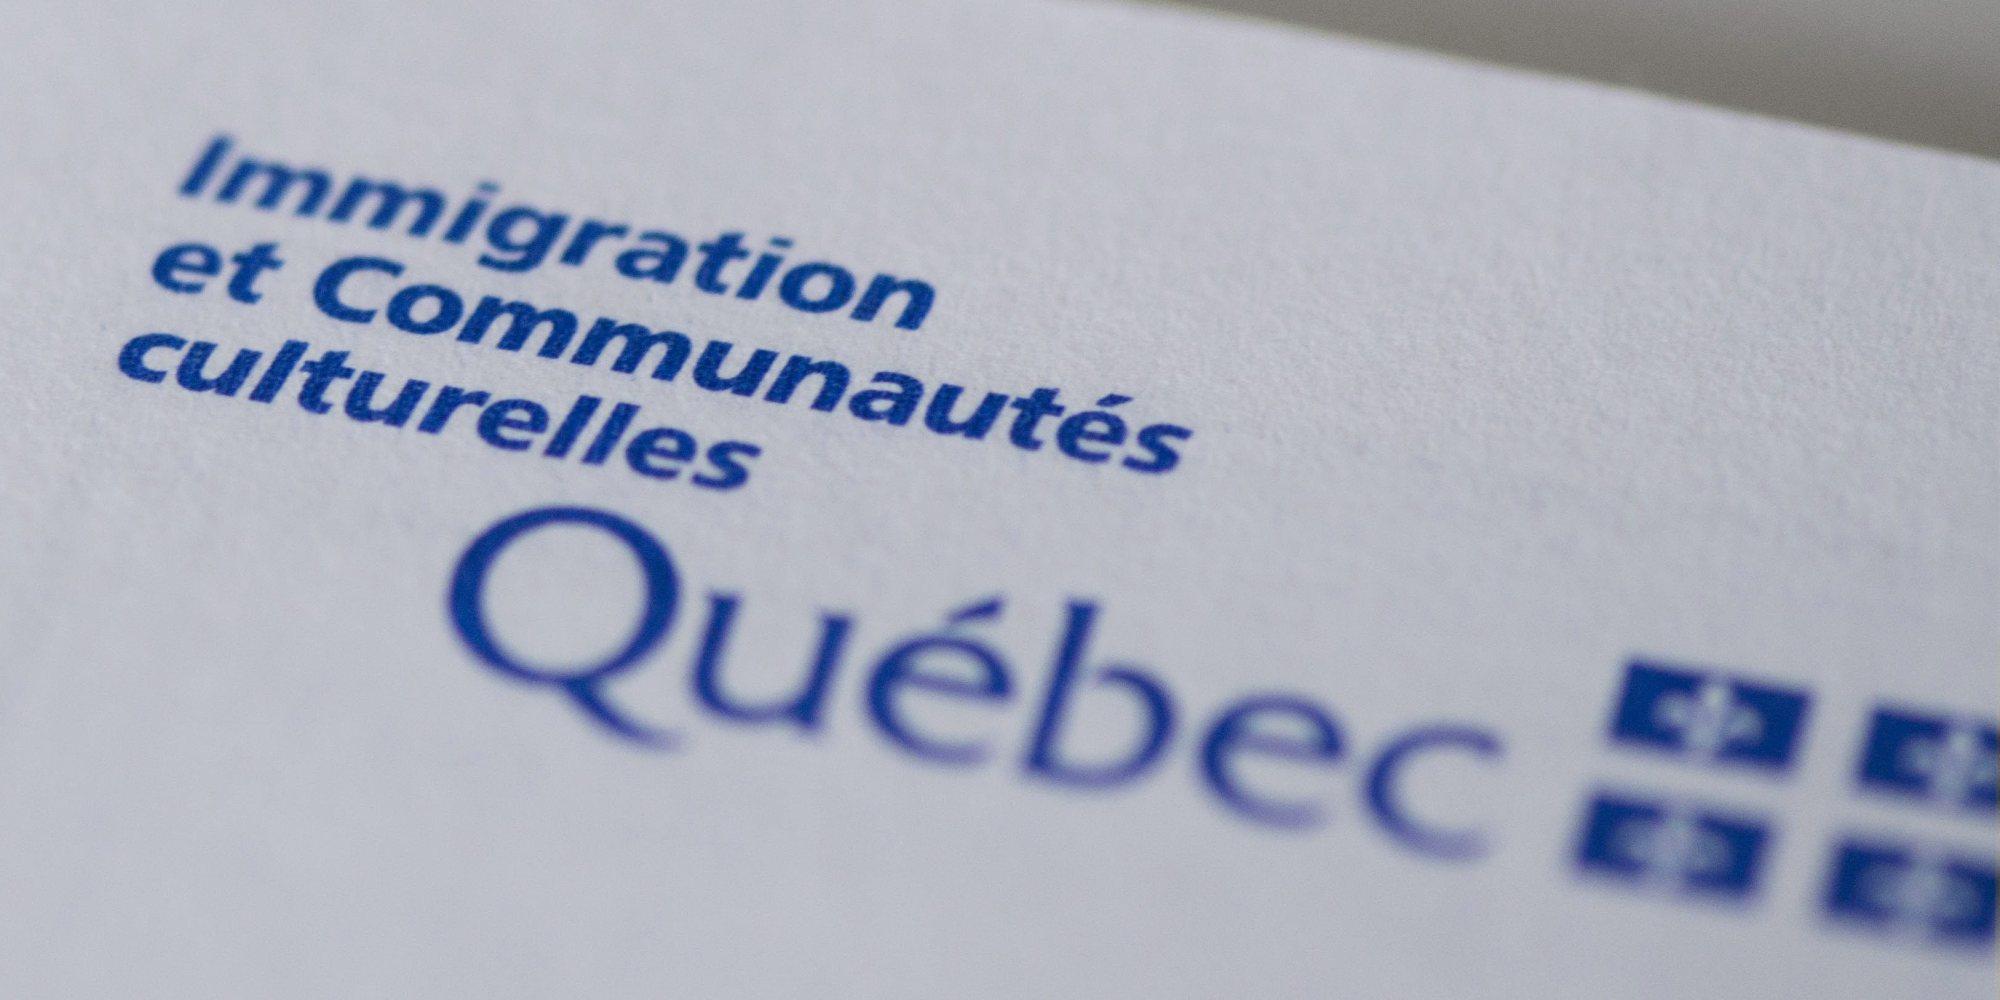 o-IMMIGRATION-ET-COMMUNAUTES-CULTURELELS-QUEBEC-facebook.jpg